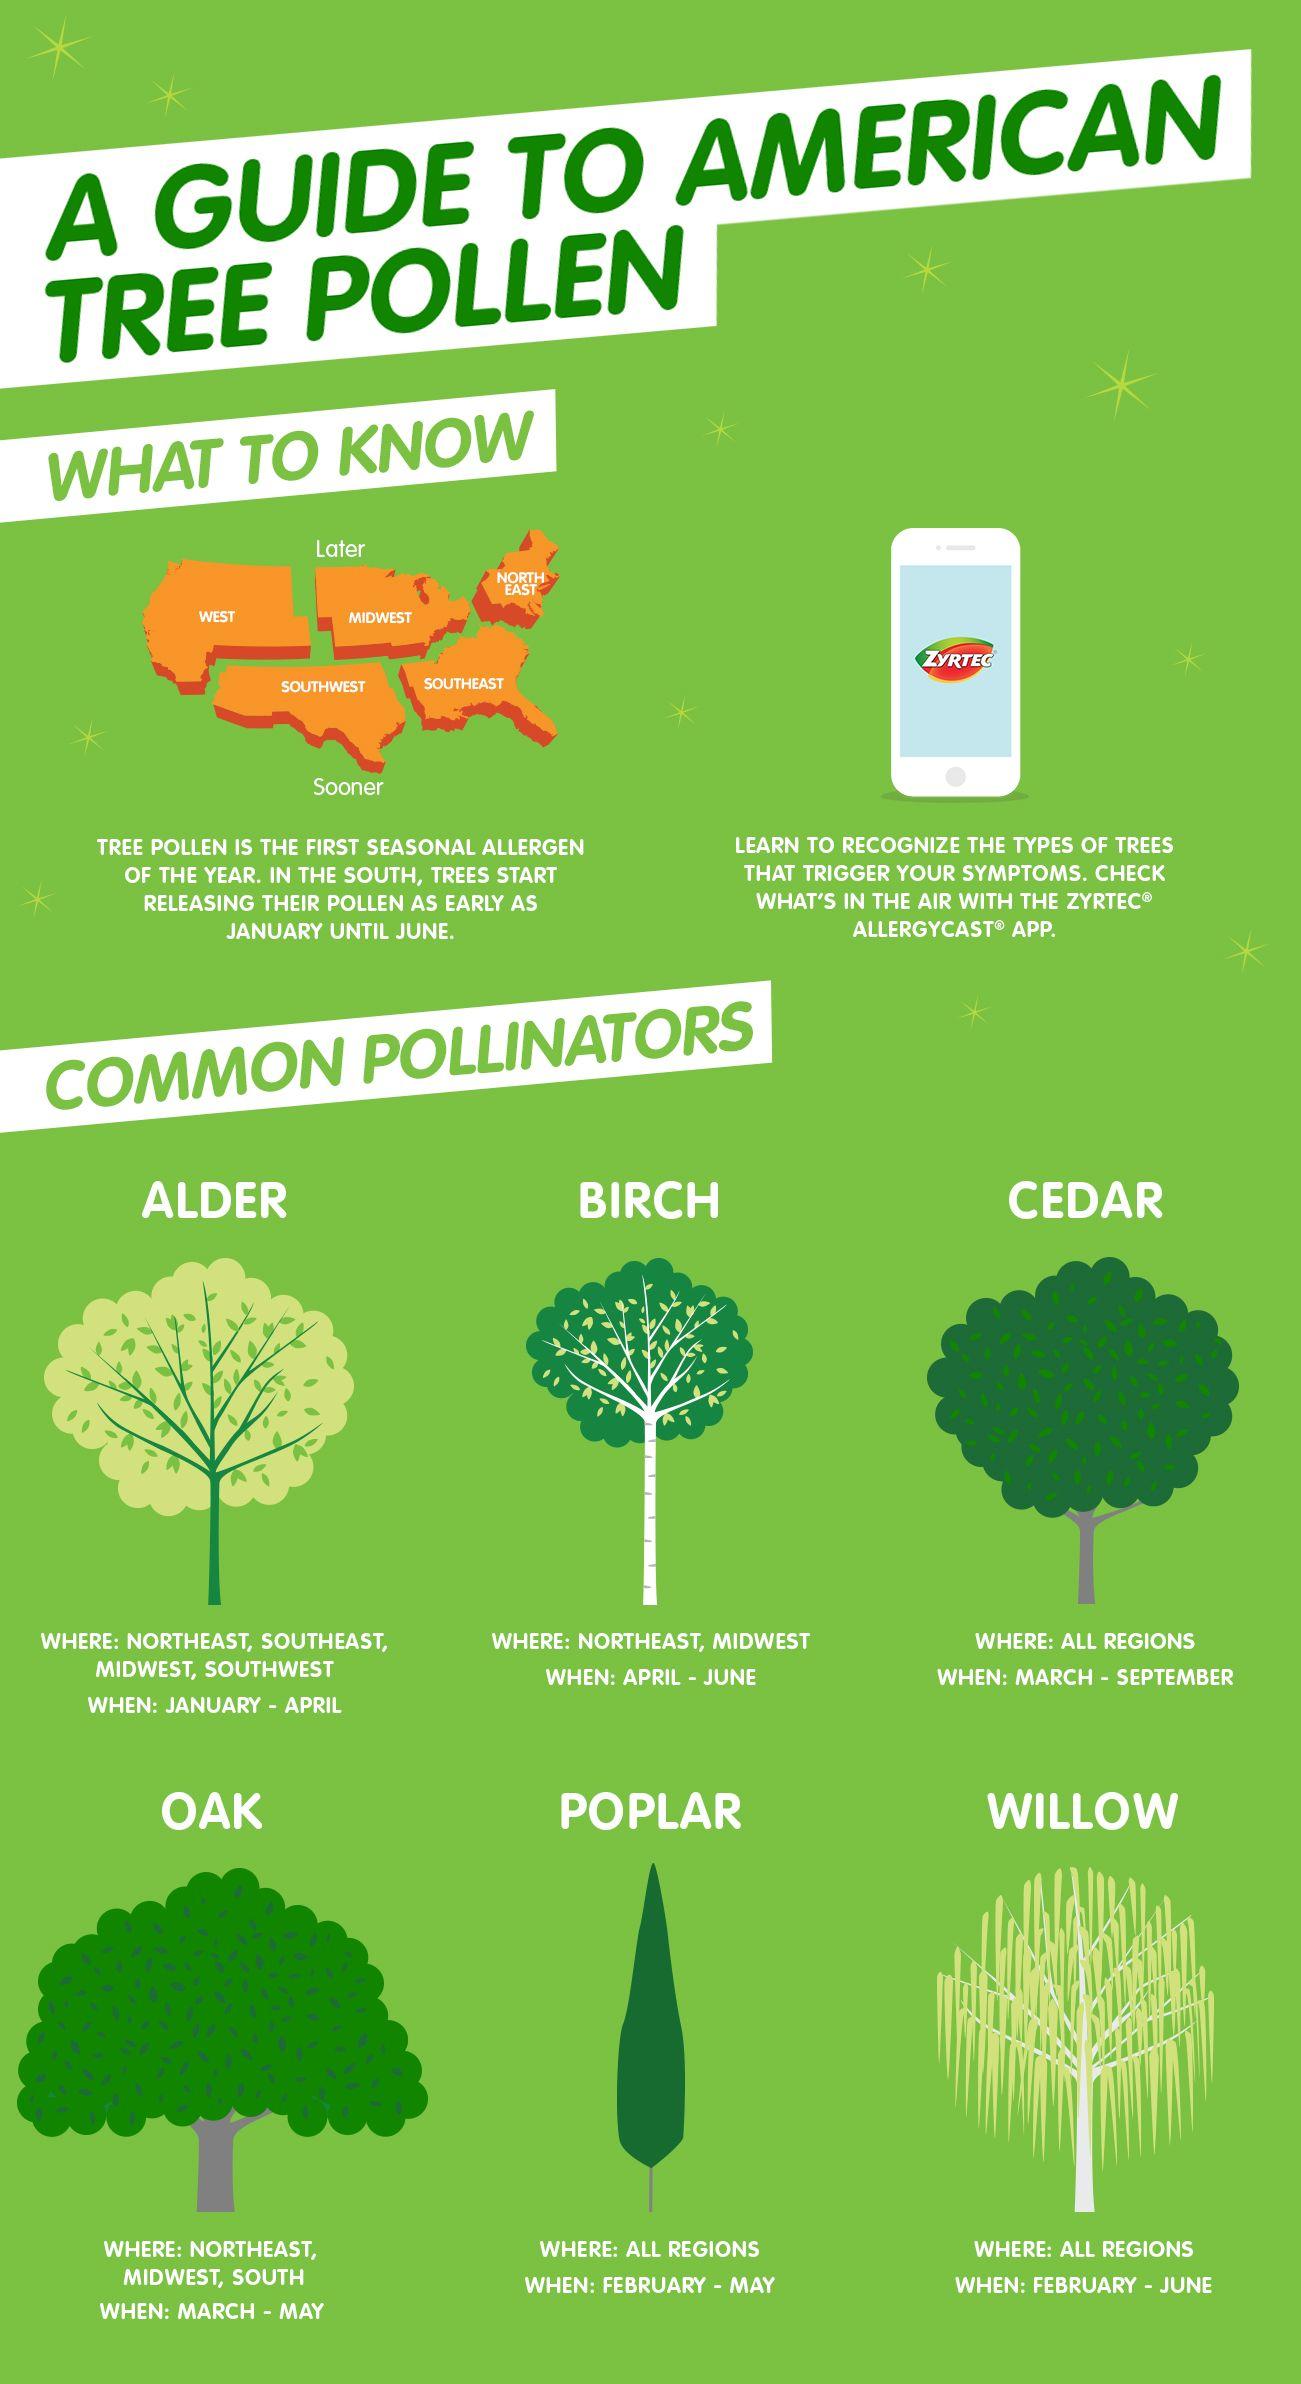 American Tree Pollen Allergy Guide Tree Pollen Allergy Tree Pollen Pollen Allergies